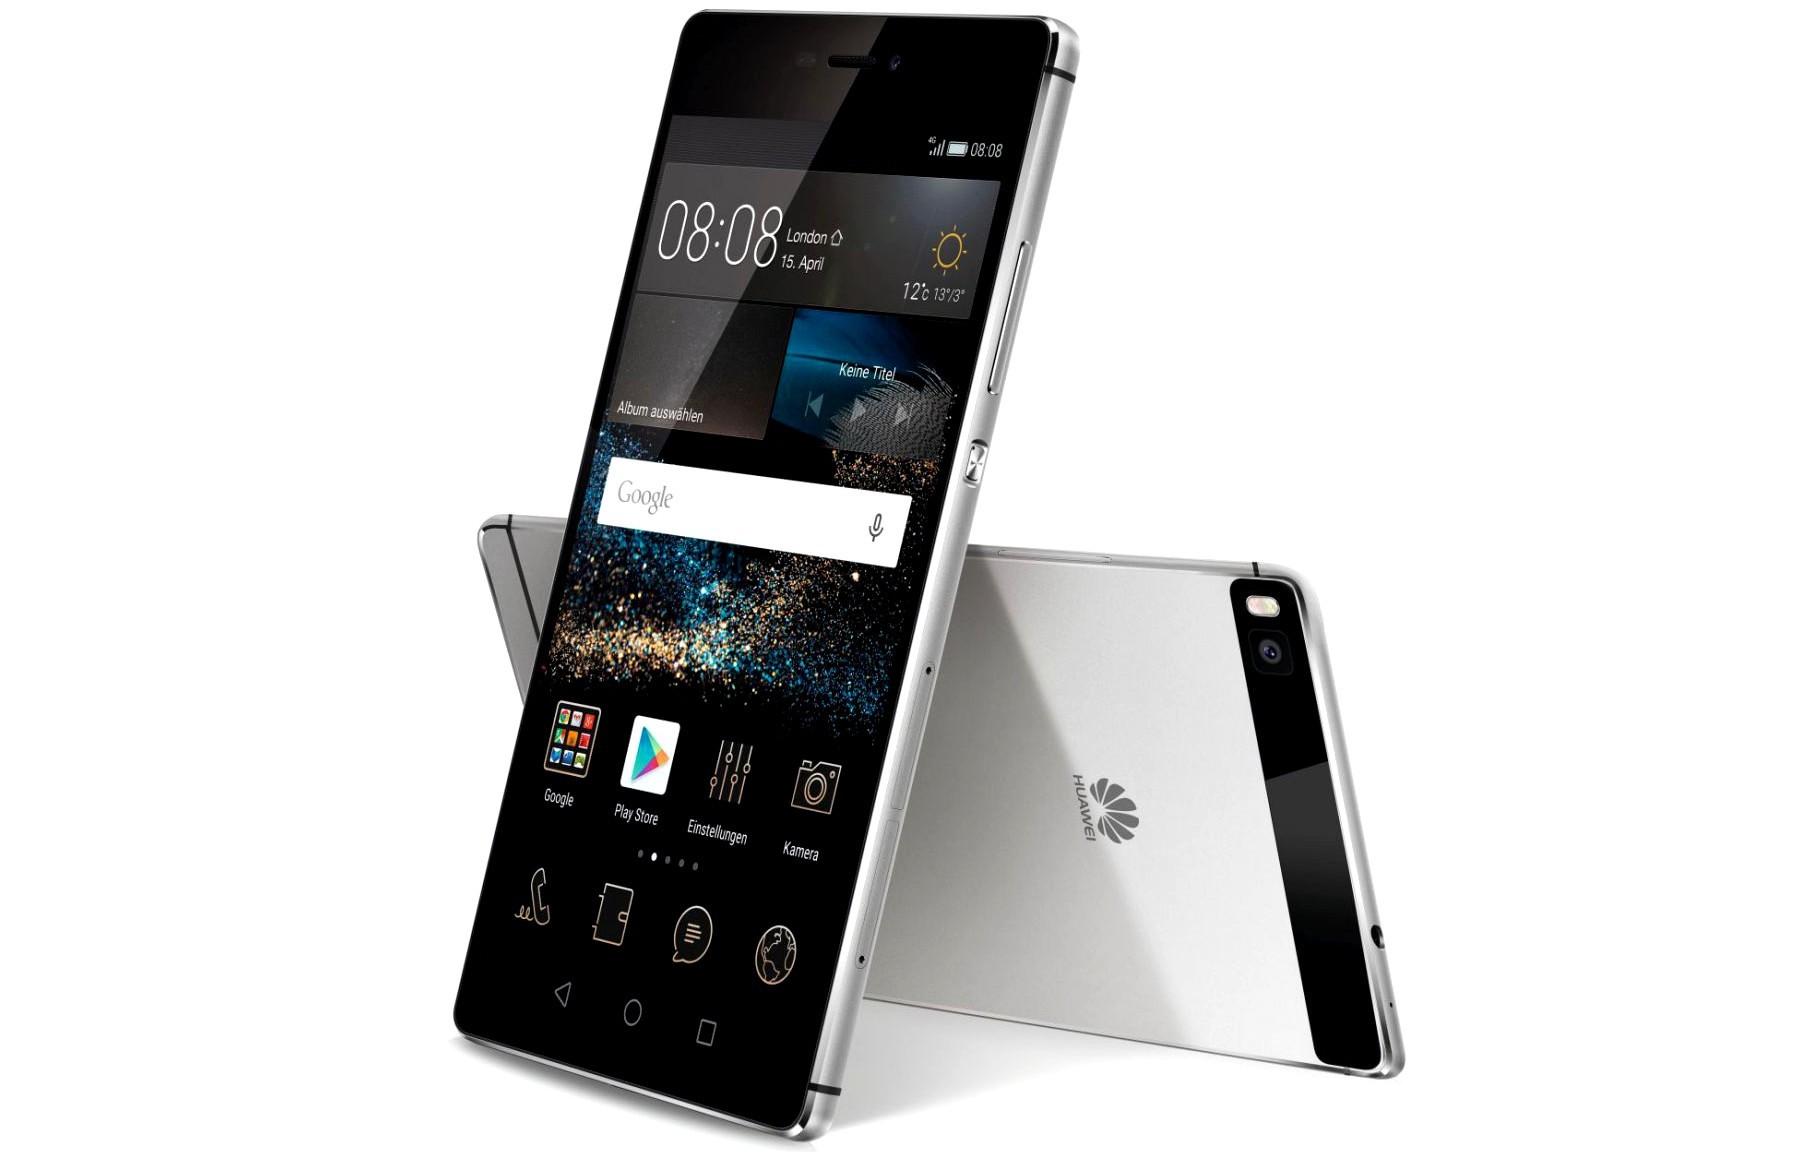 Huawei Ascend P9 در چهار مدل مختلف